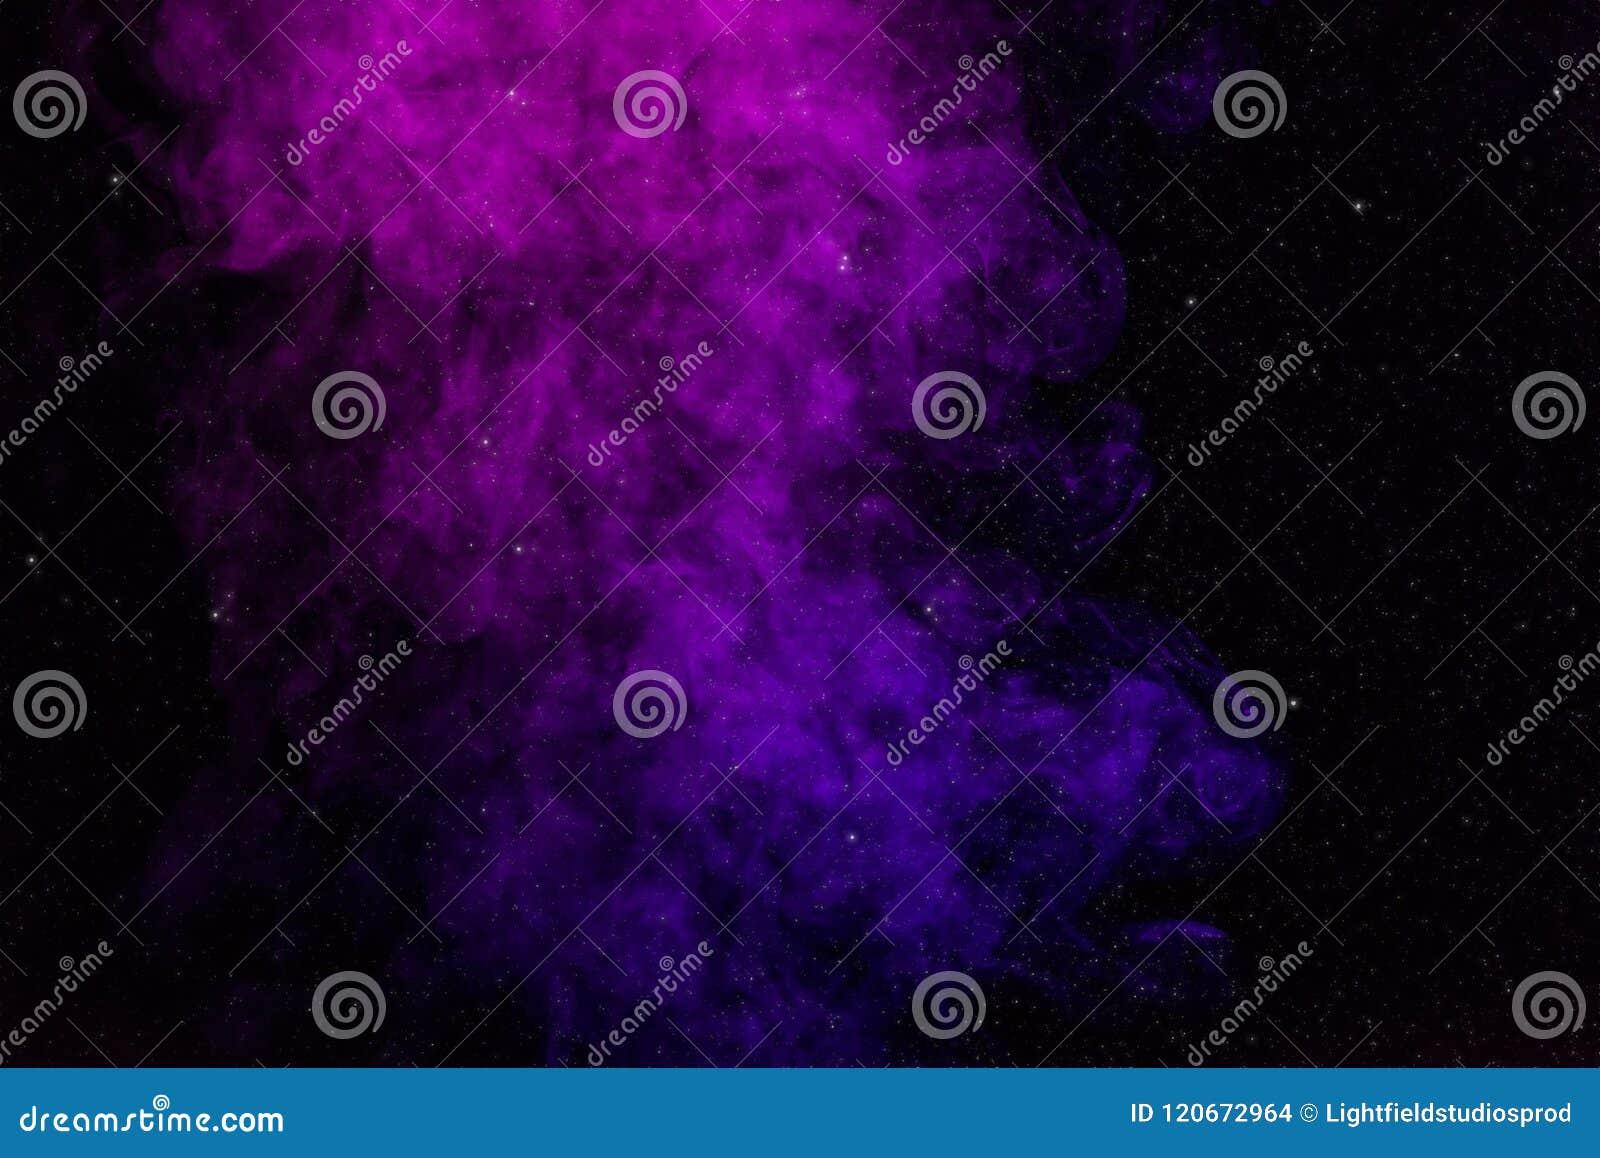 Zwarte achtergrond met purpere, roze rook